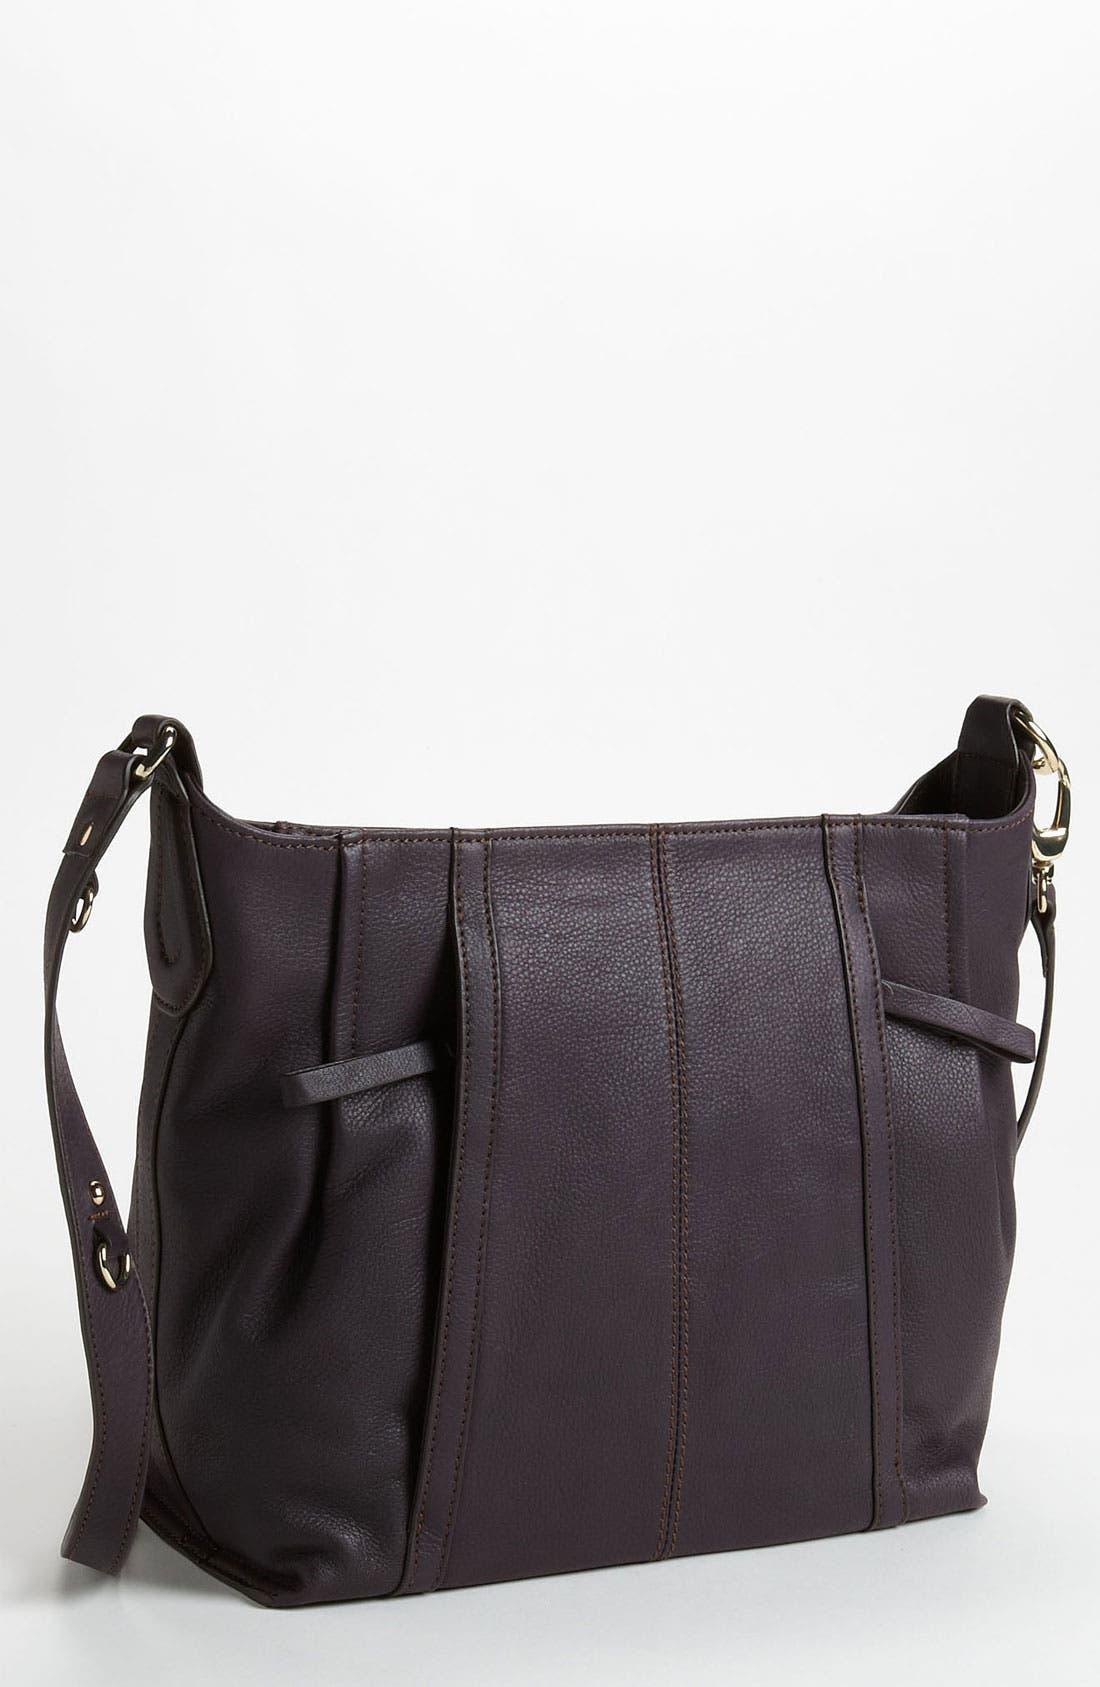 Alternate Image 1 Selected - Perlina 'Paulina' Leather Bucket Bag